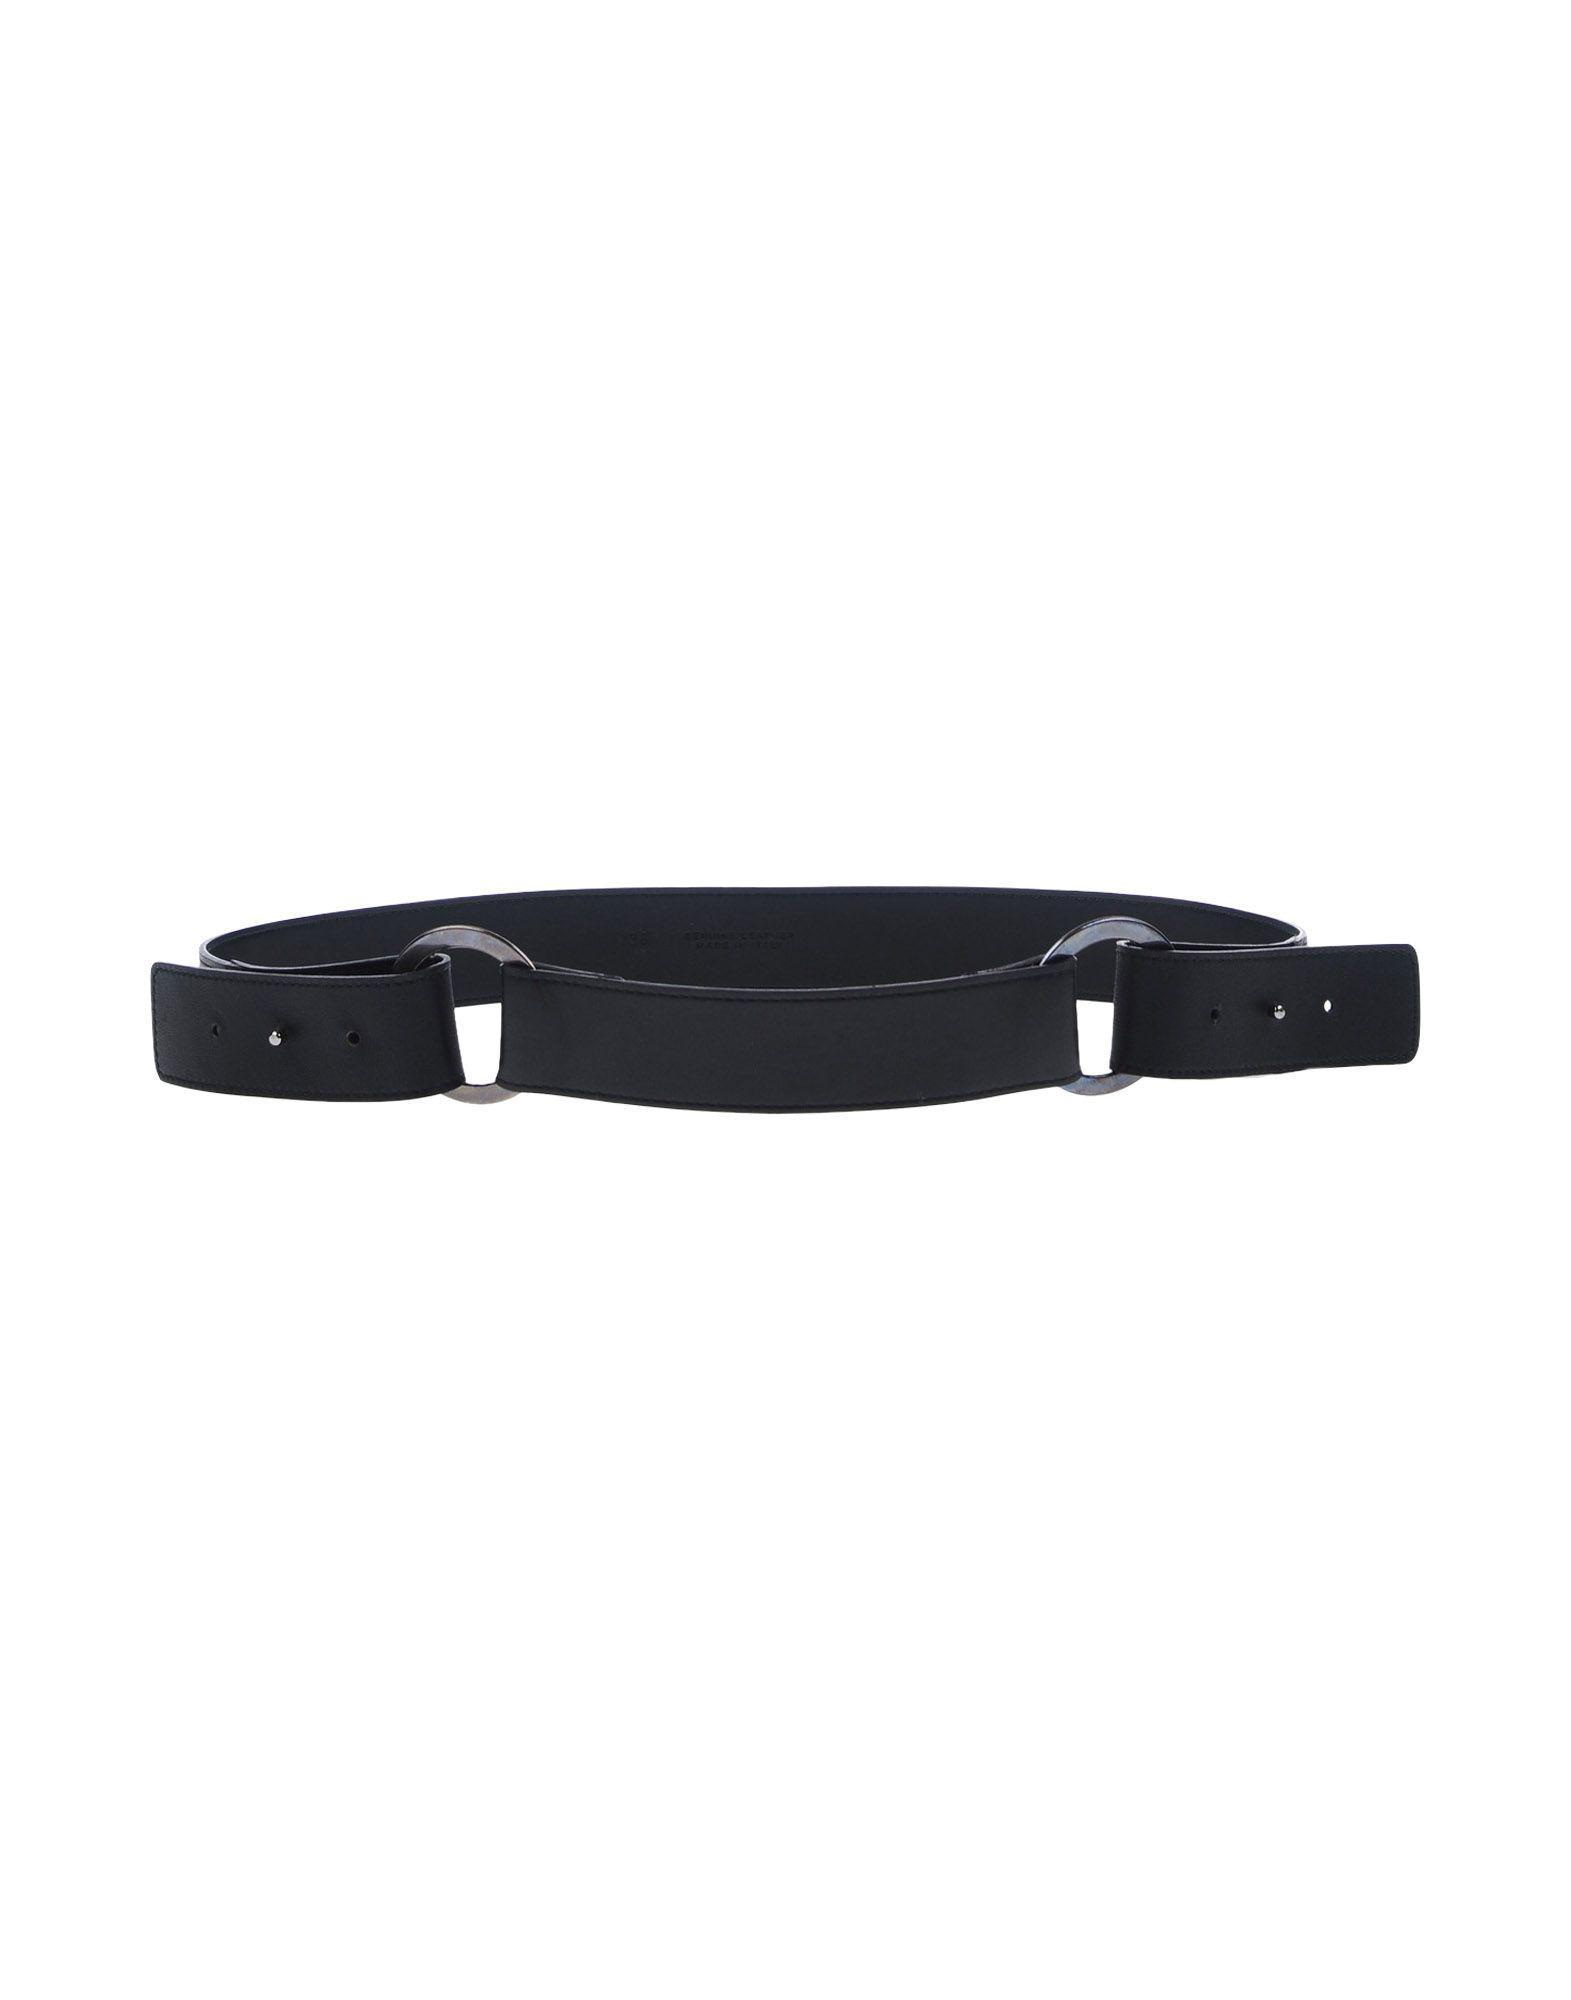 Small Leather Goods - Belts Laura Urbinati 7KUMd